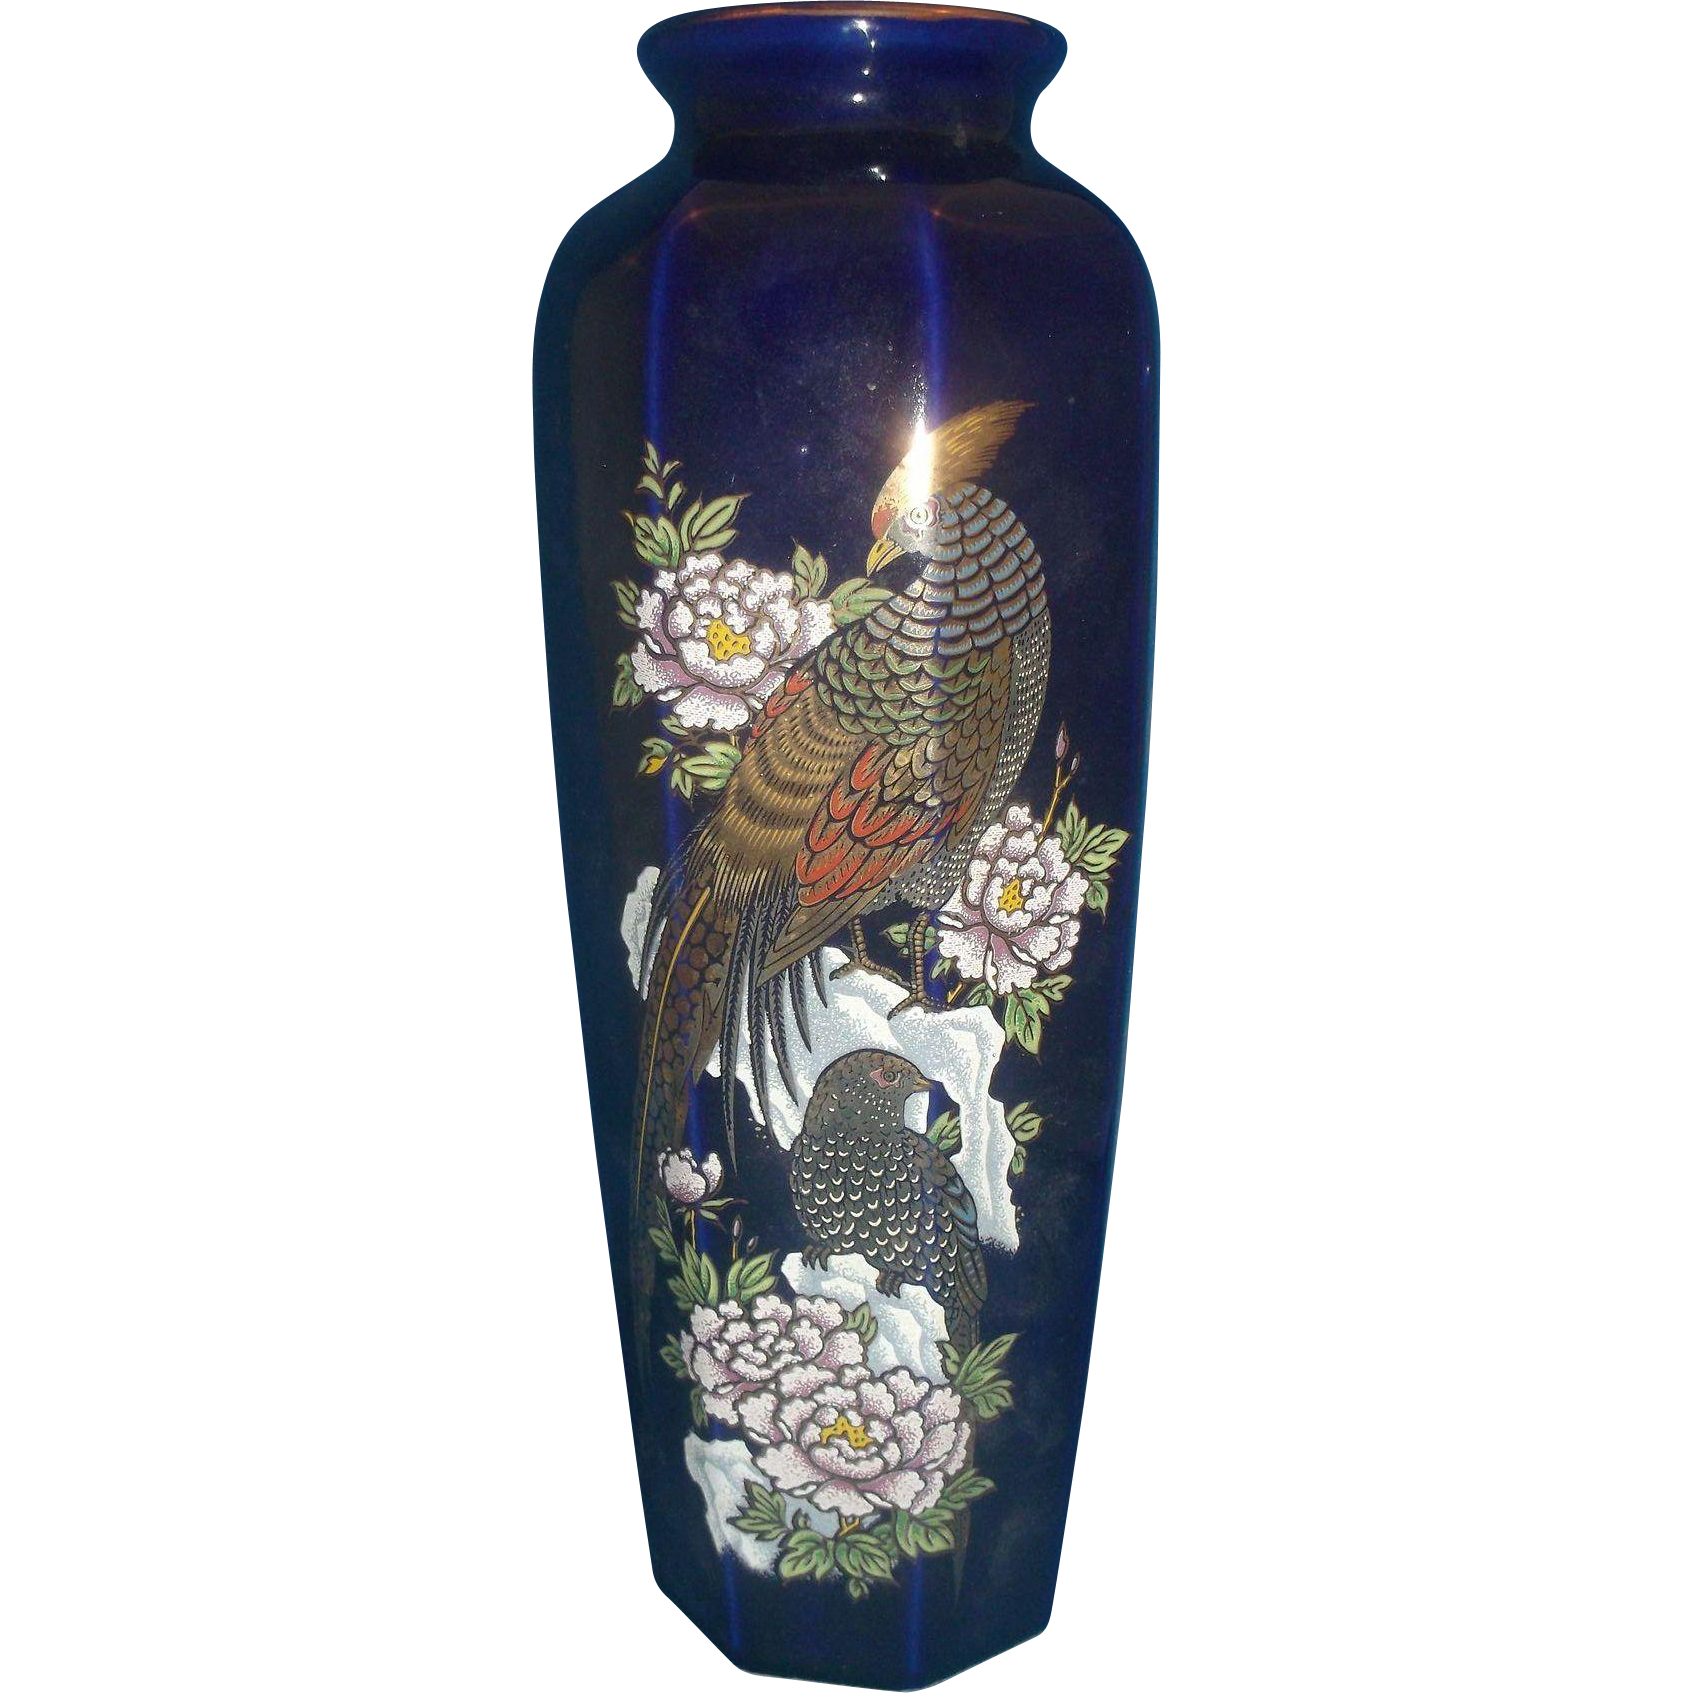 Cobalt Blue Tall Paneled Vase Pheasant Peonies Gilded Paneled Vase Himark Japan